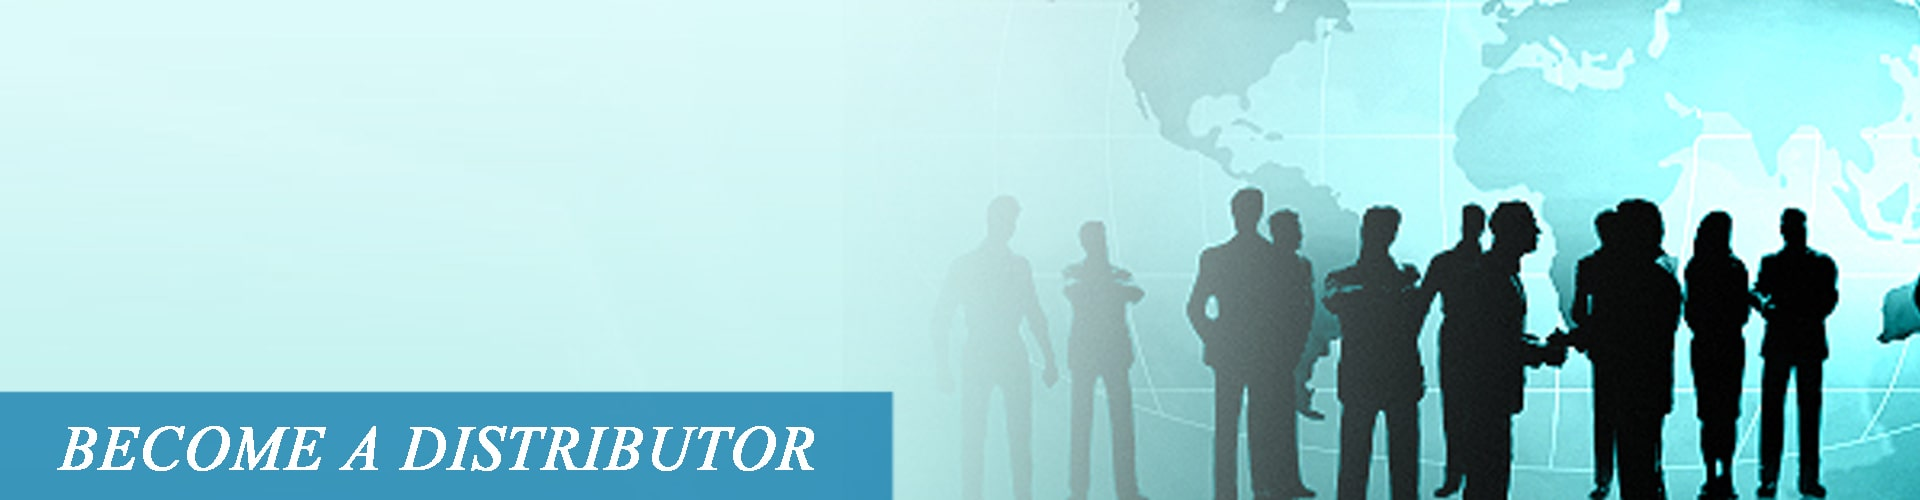 become a distributor-min